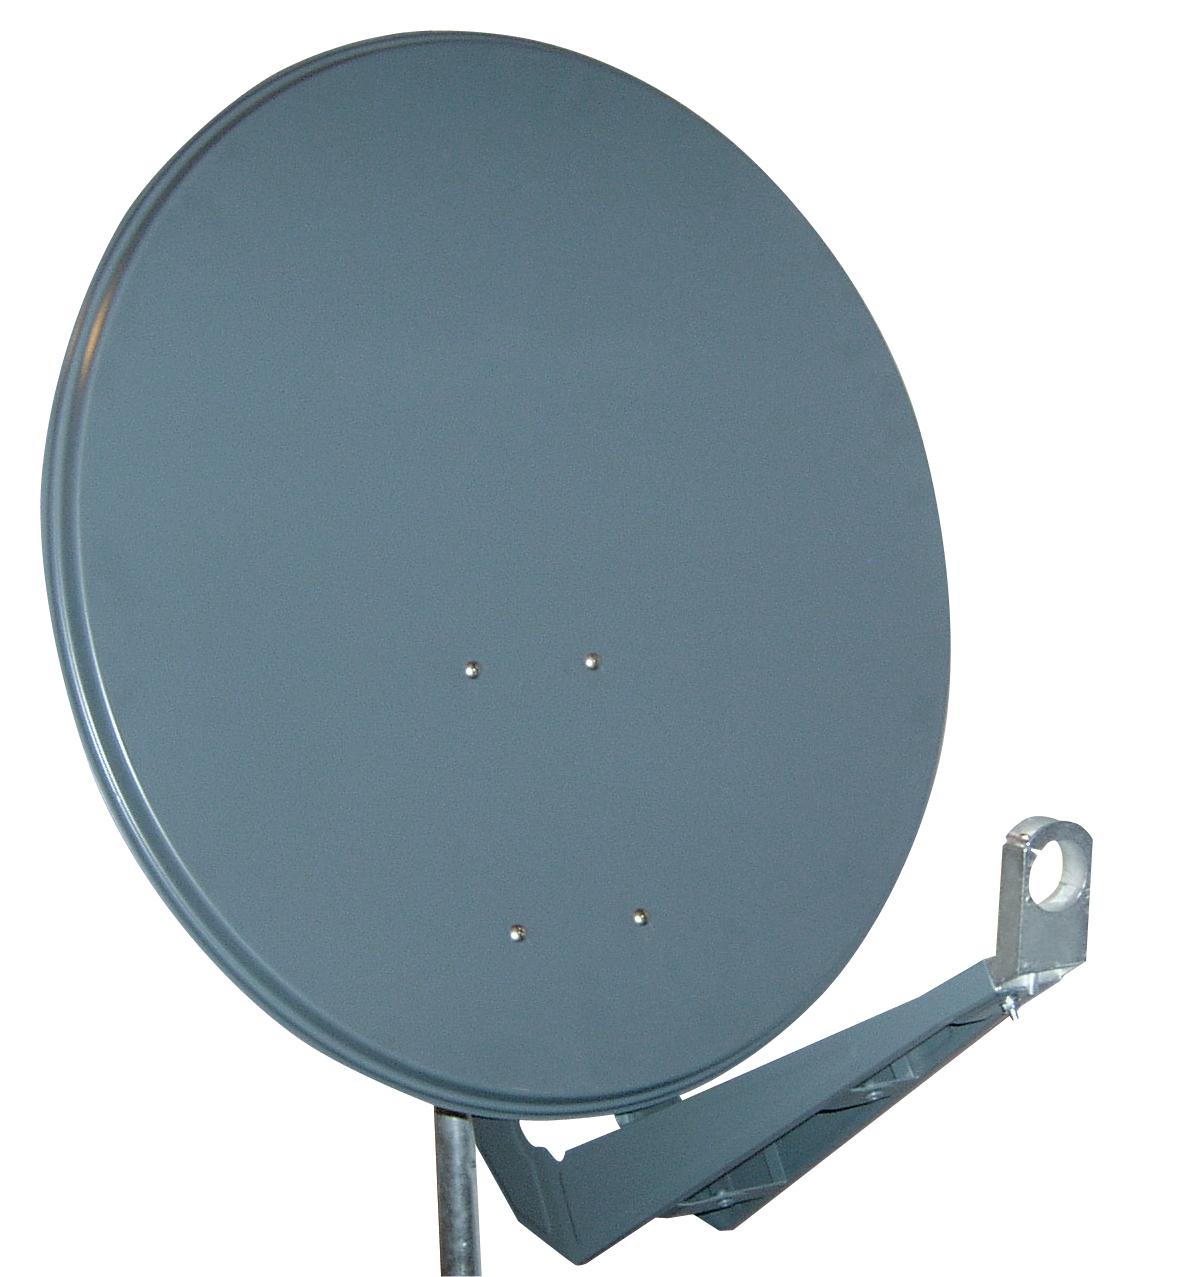 1 Stk SAT Antenne  85/80cm,Alu,40dB Gain,Doppel Monoblok Arm,Anthr HSATA085AA